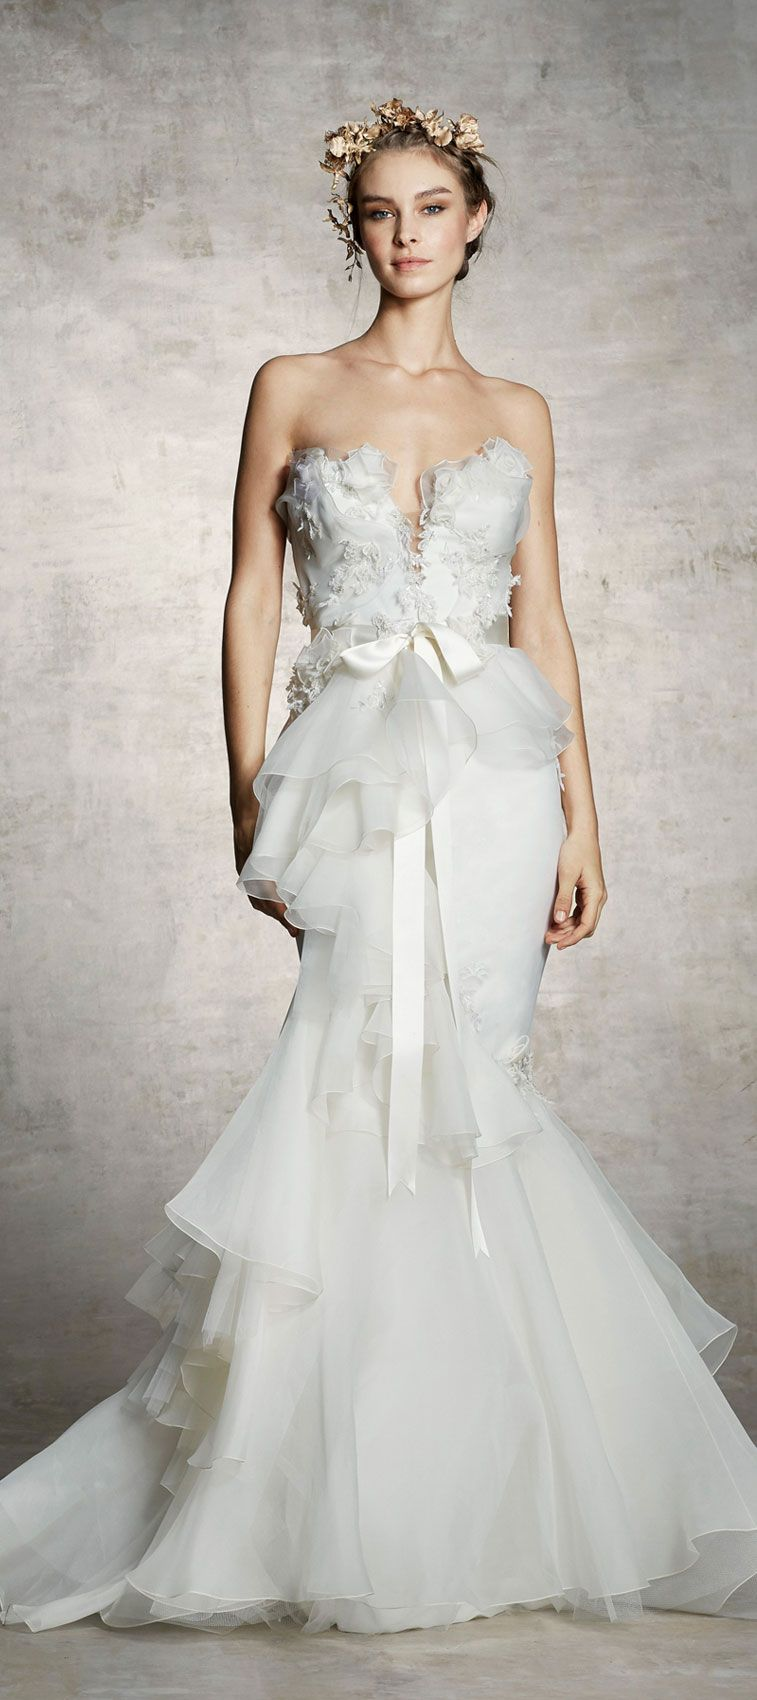 Marchesa Spring 2019 Bridal Collection